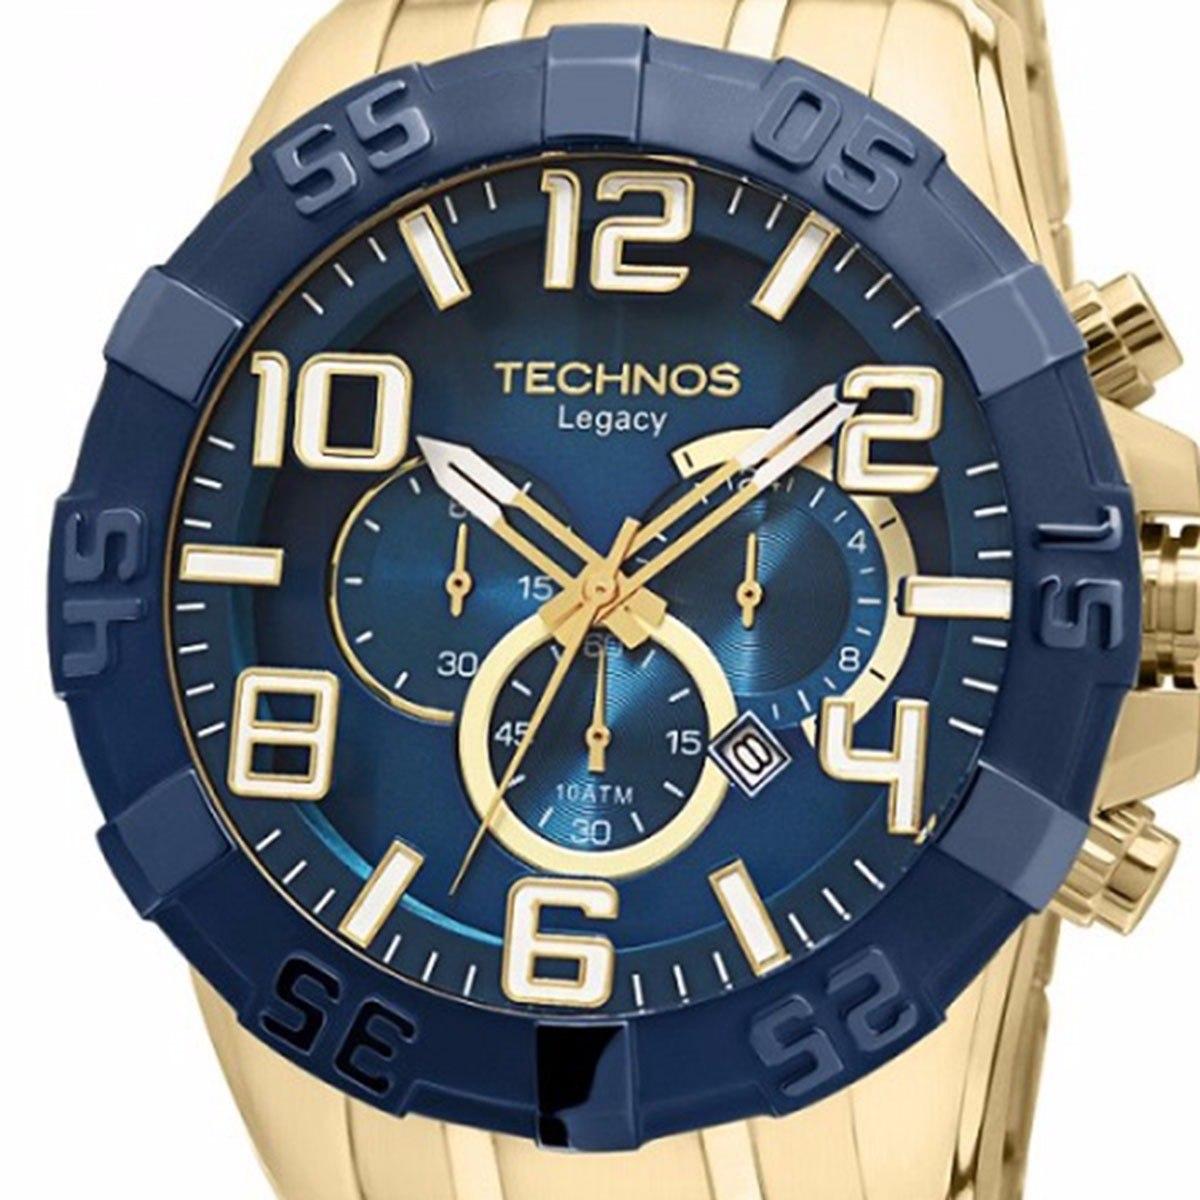 Relógio Masculino Technos Legacy - Os20iq 4a + Nfe - R  699,00 em ... 58ce095d51